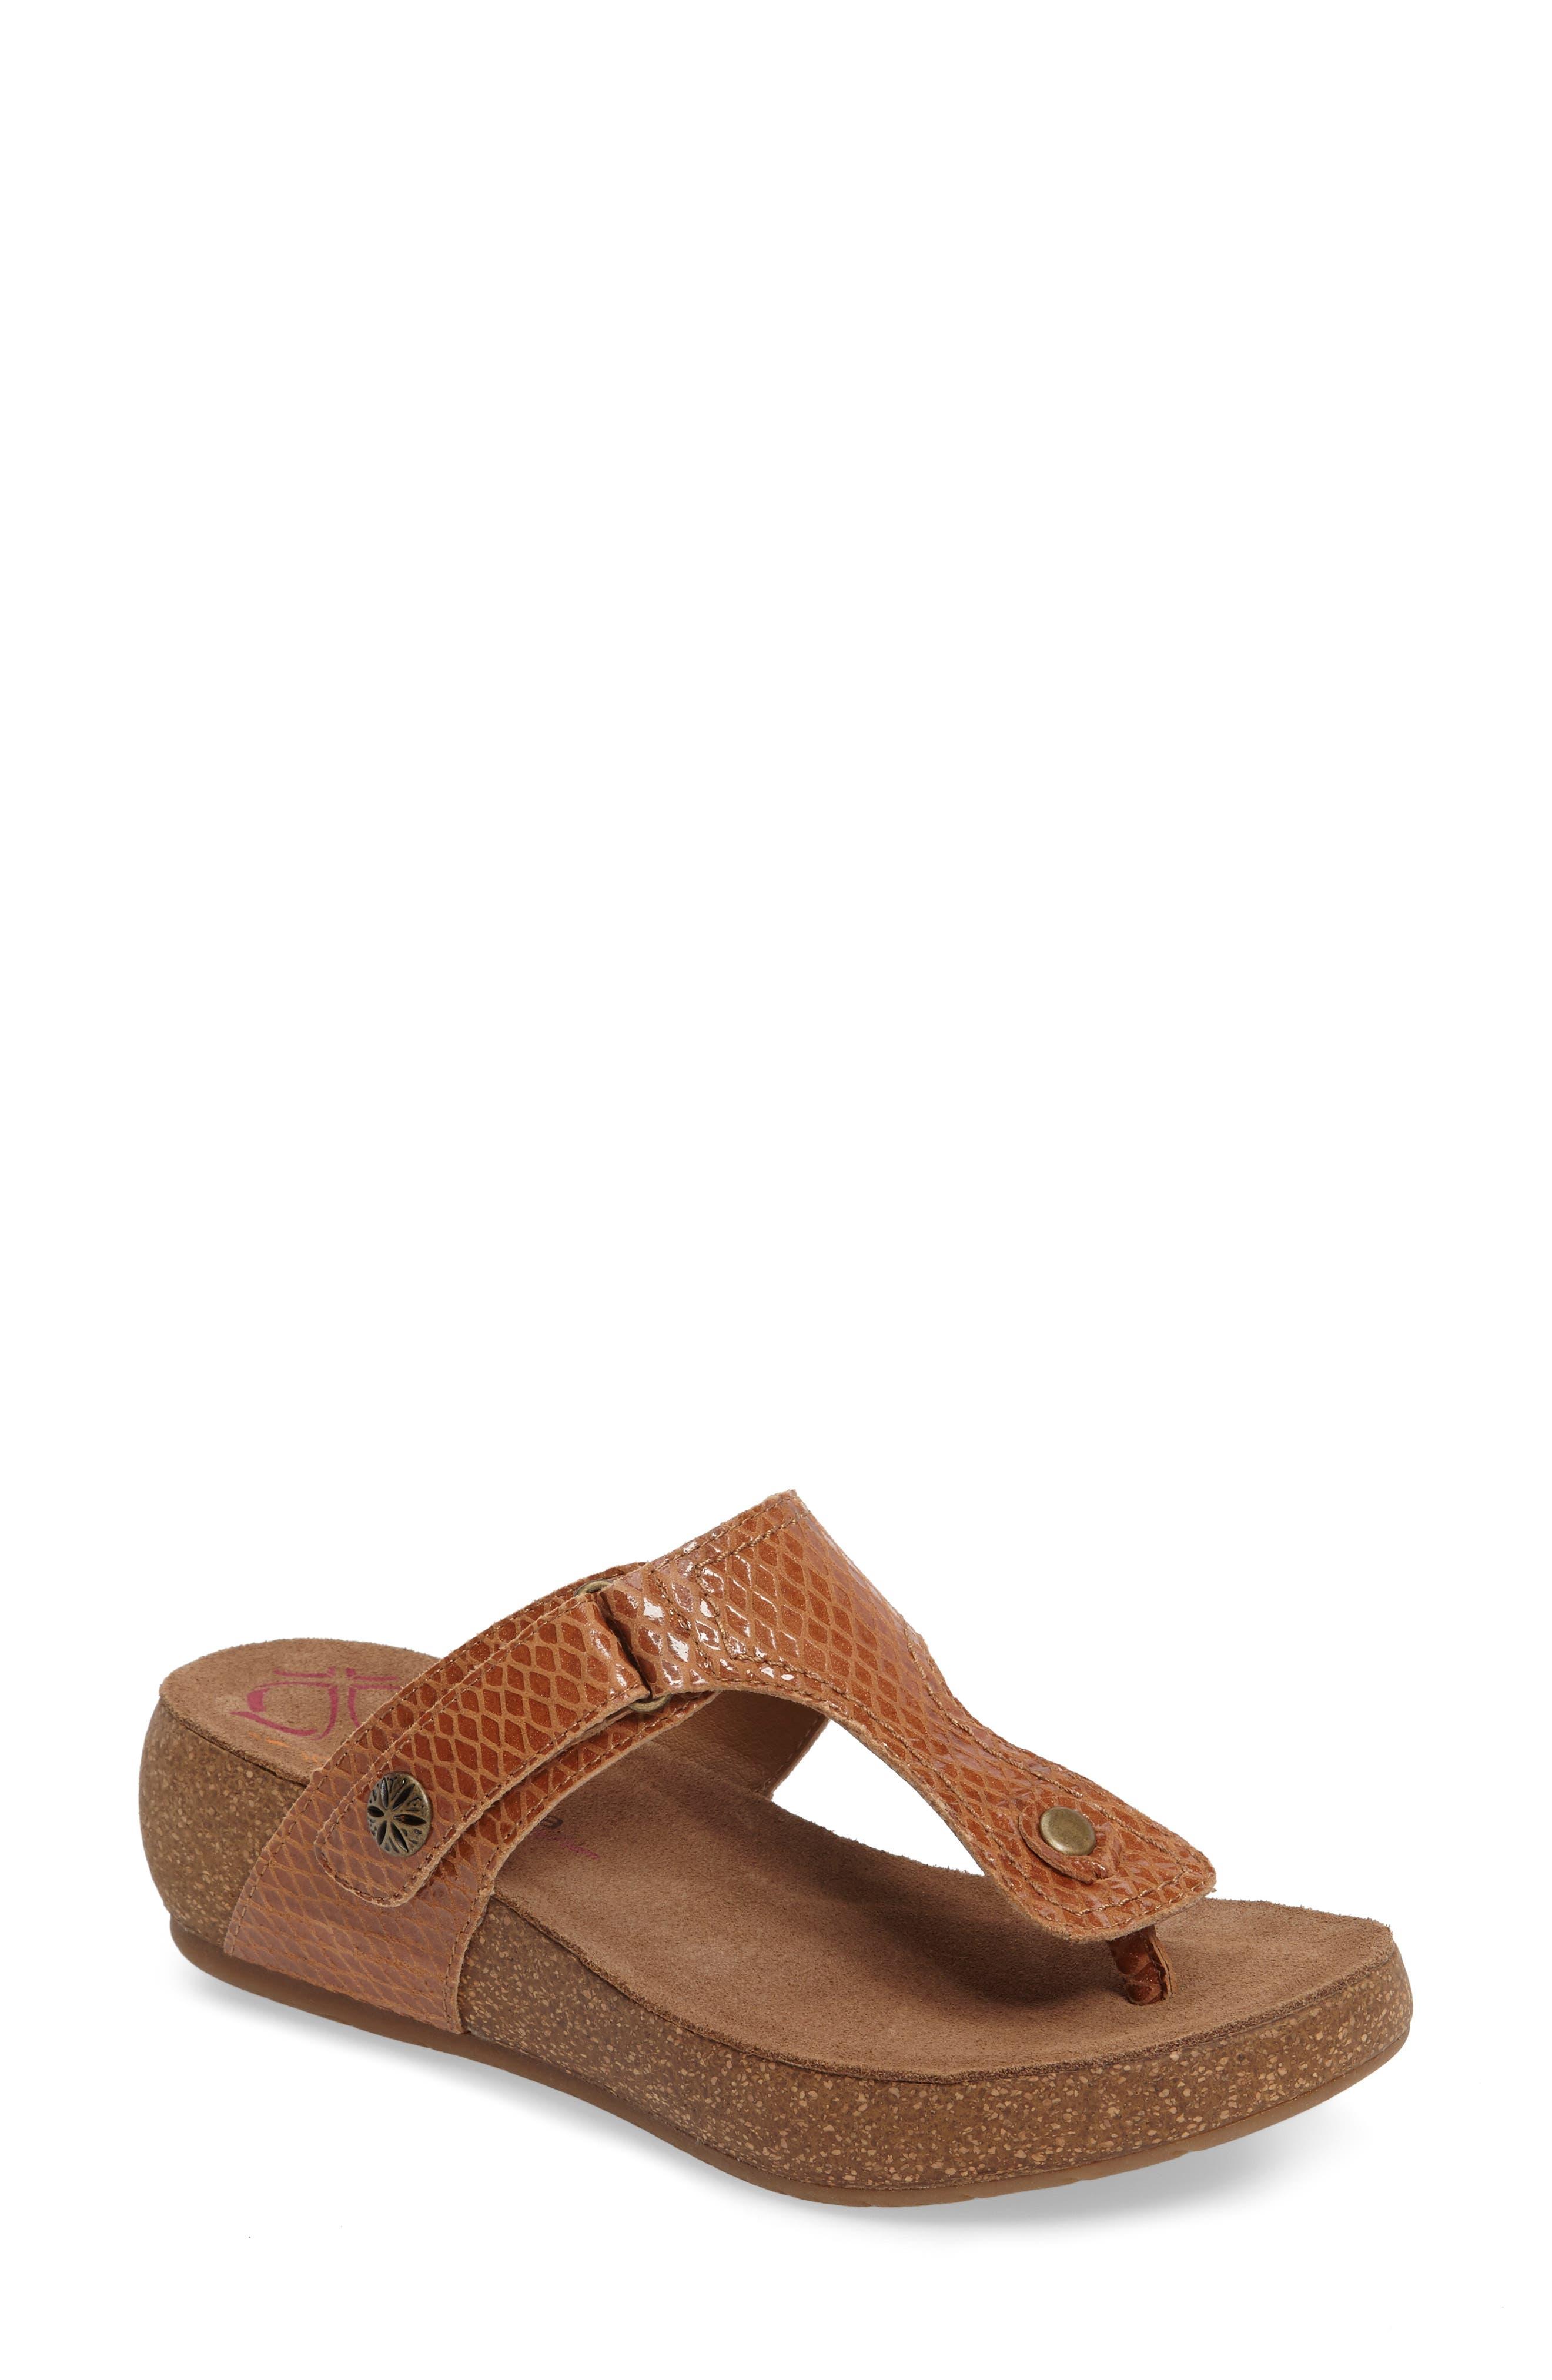 Shantel Flip Flop,                         Main,                         color, Luggage Print Leather